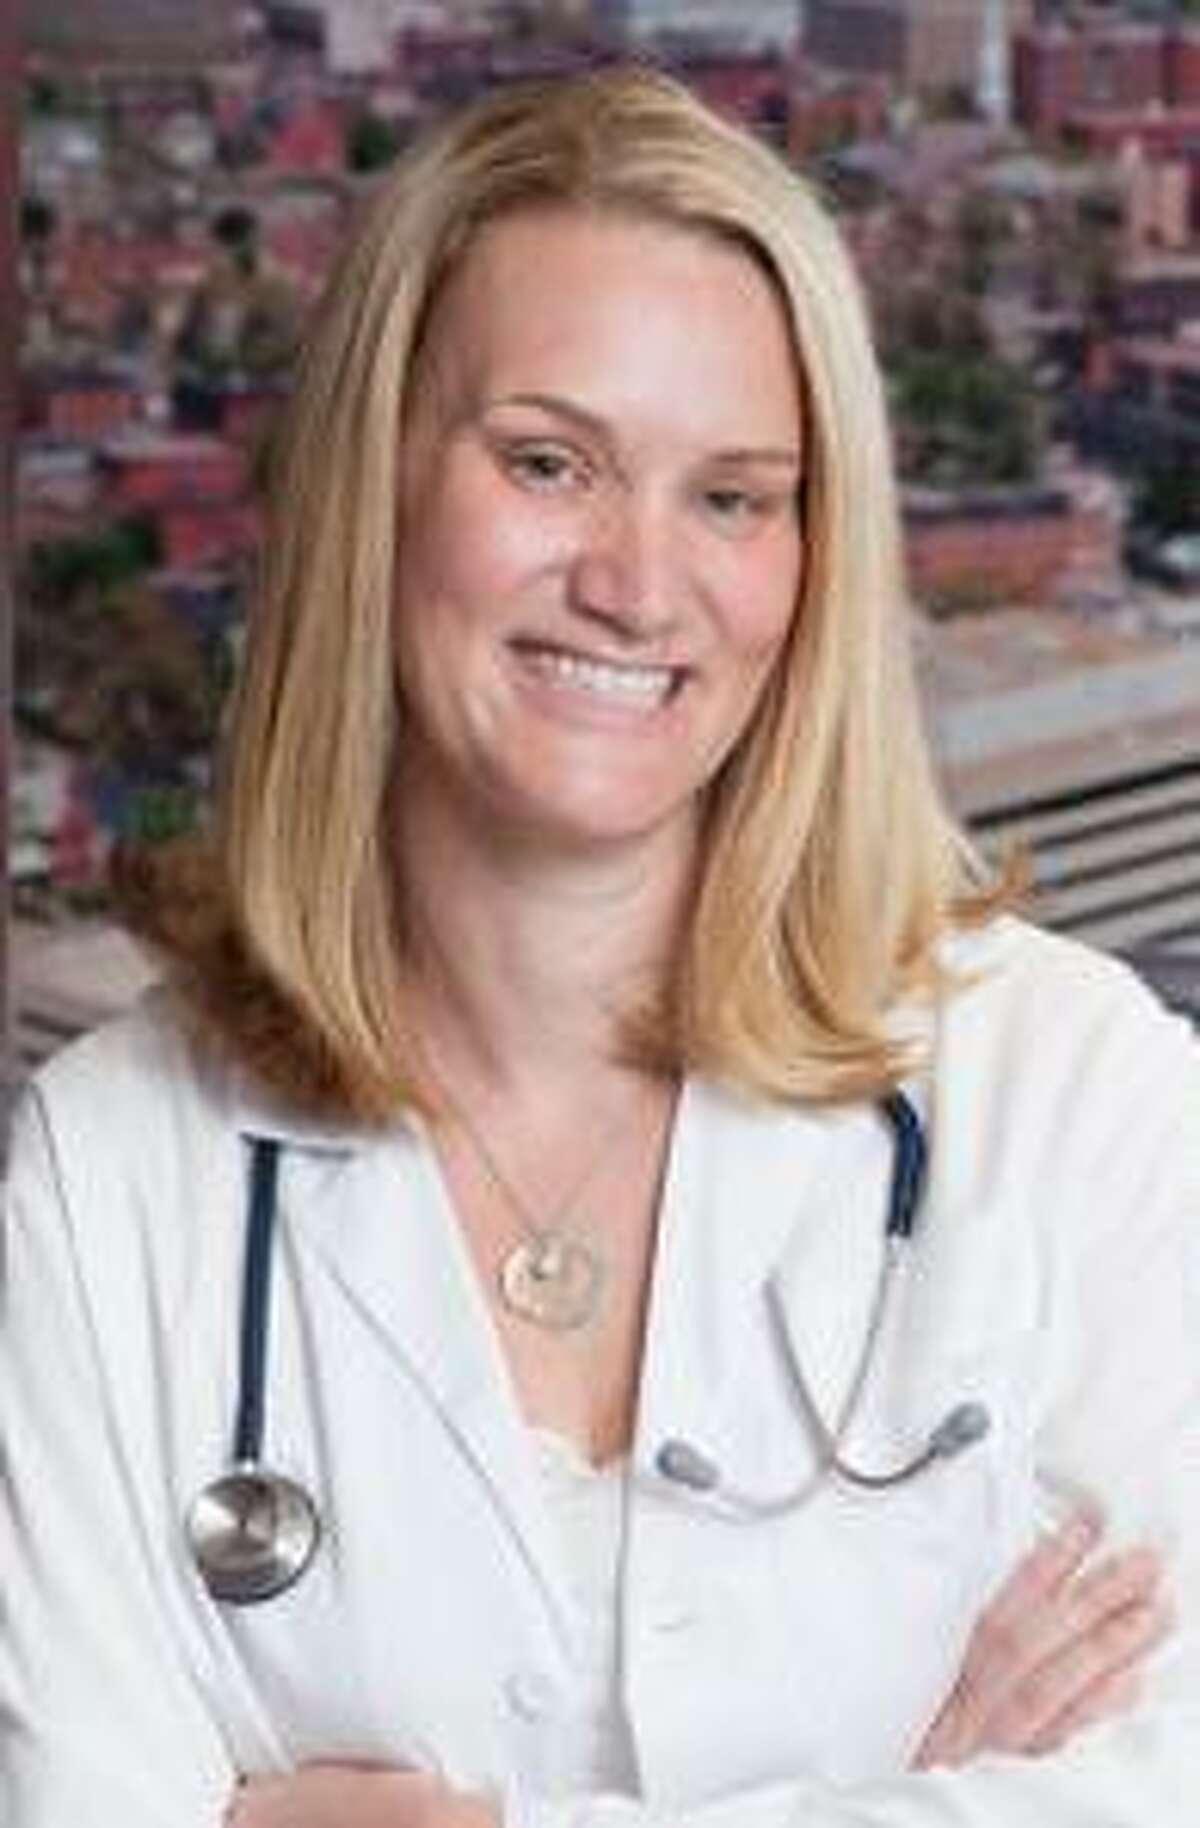 Gaylord Hospital Medical Director Dr. Megan Panico